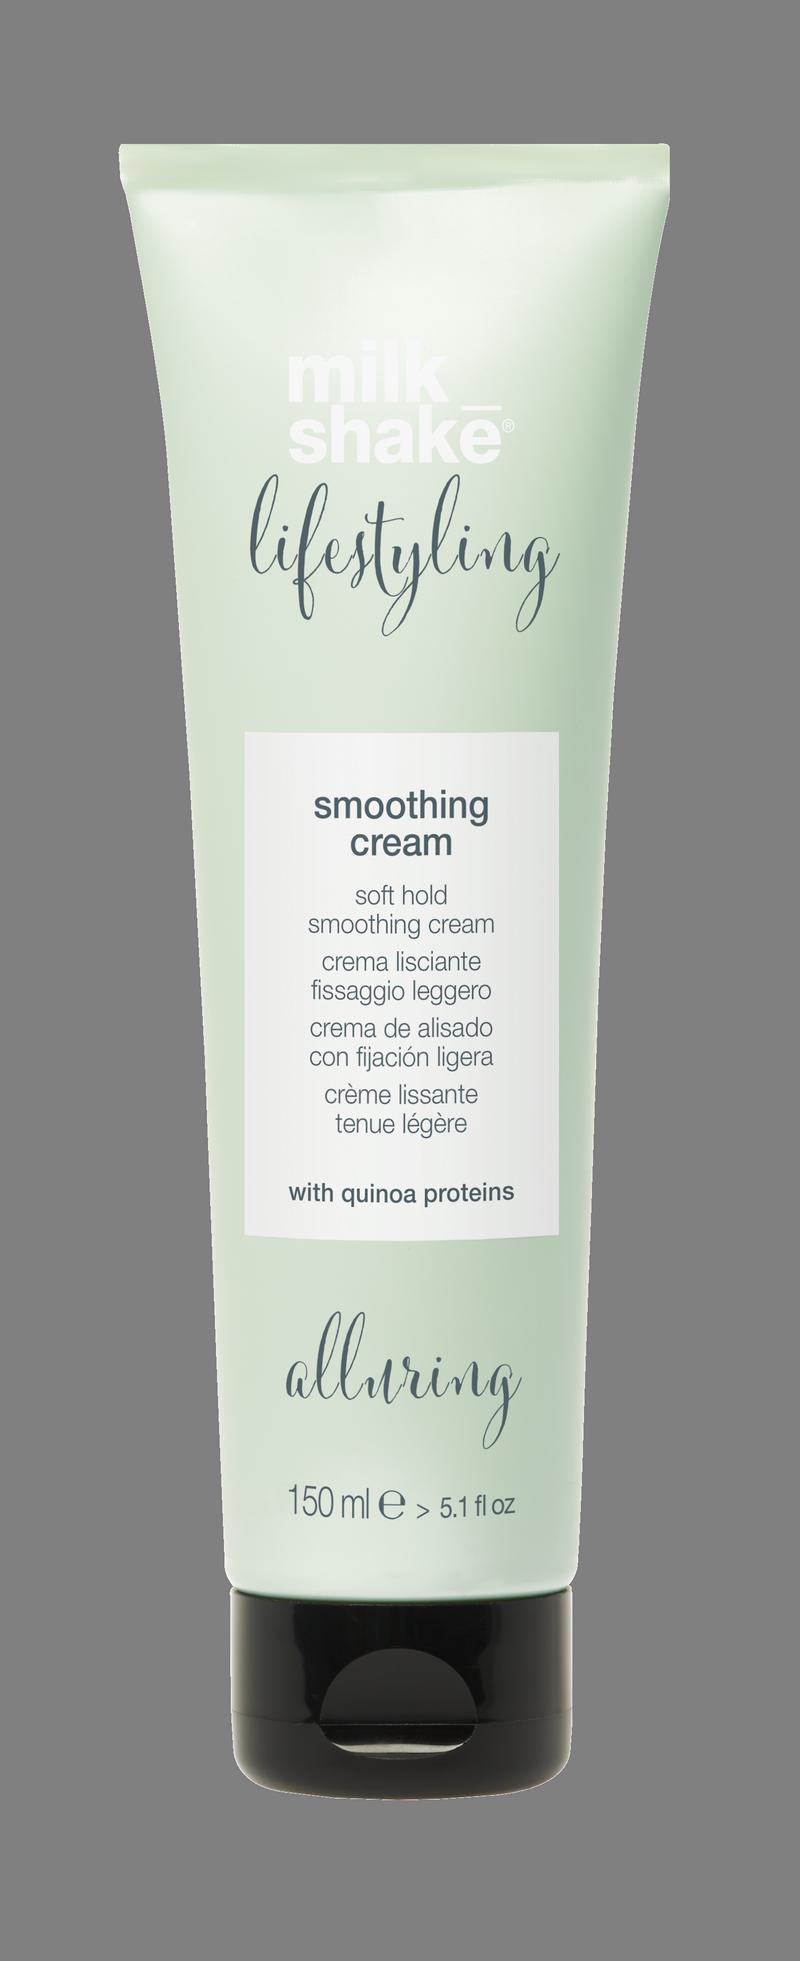 Milk Shake Lifestyling Smoothing Cream 150ml